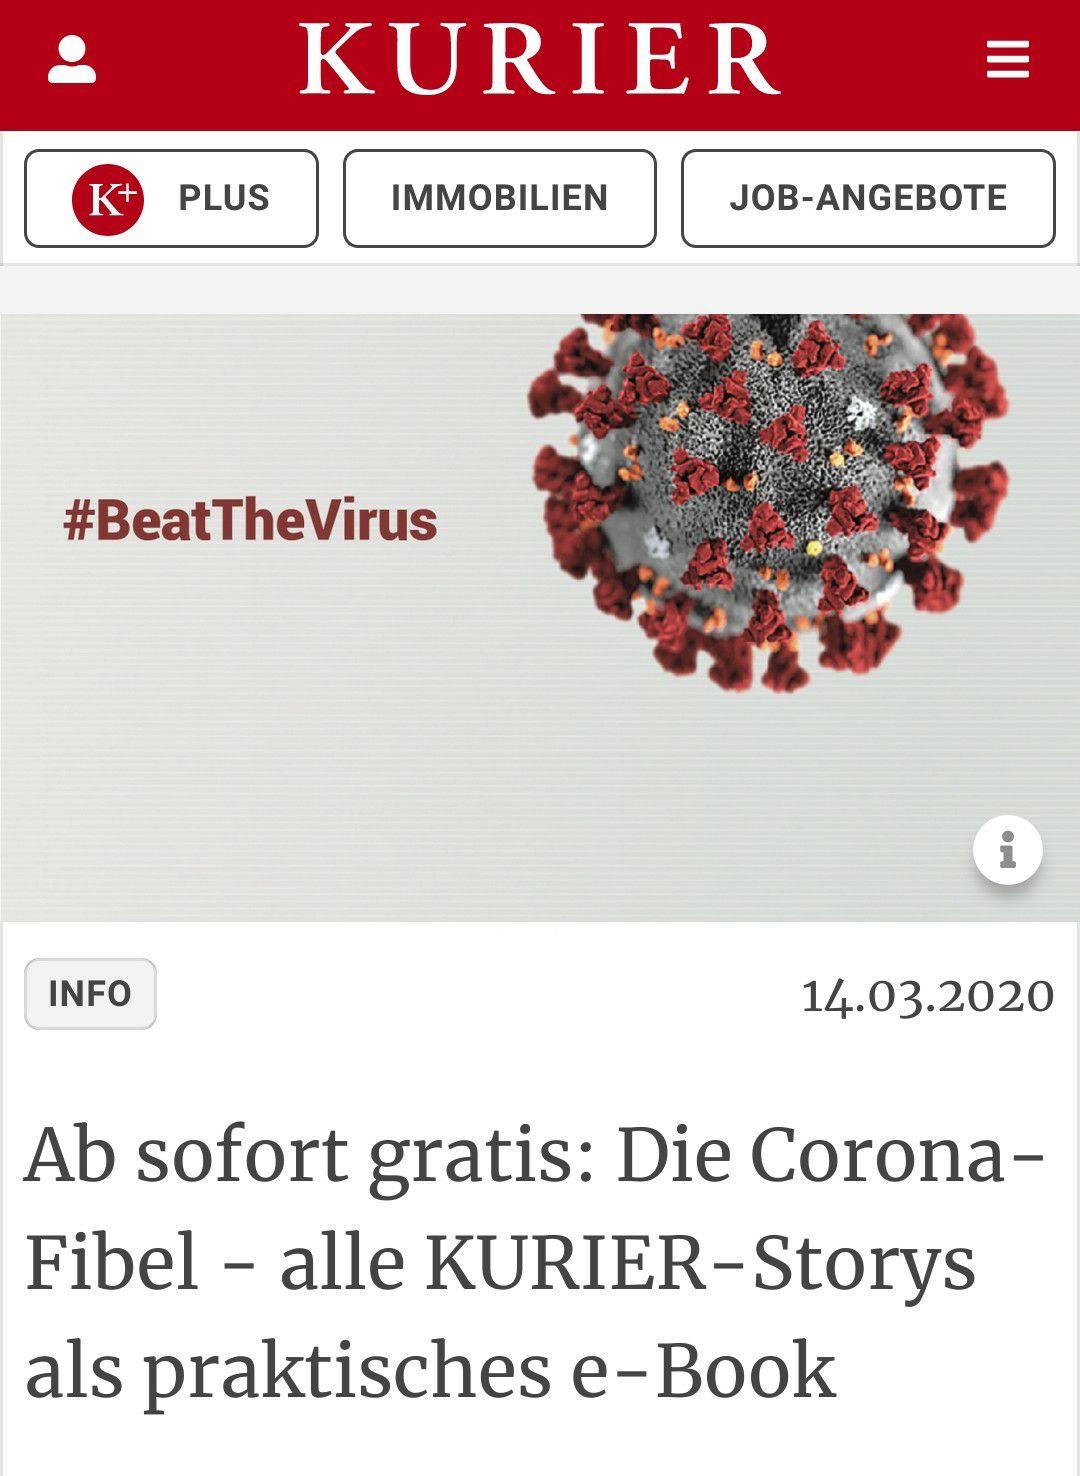 Ab sofort gratis: Die Corona-Fibel - alle KURIER-Storys als praktisches e-Book